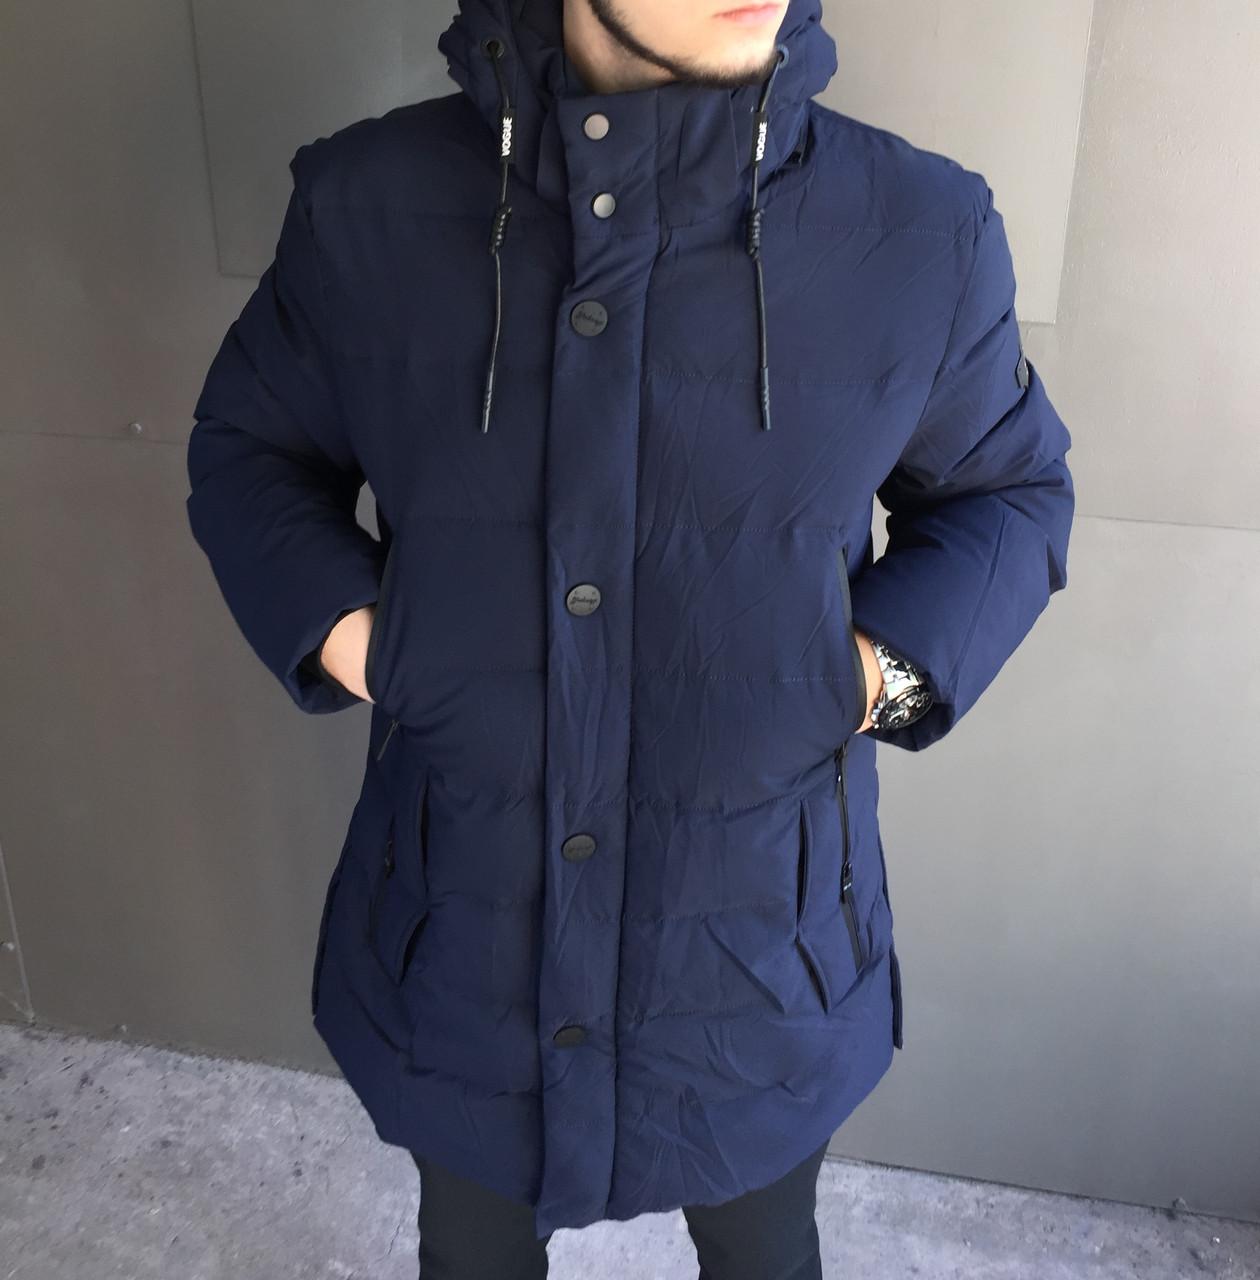 Мужская зимняя куртка Boos Jack.Тёмно синяя